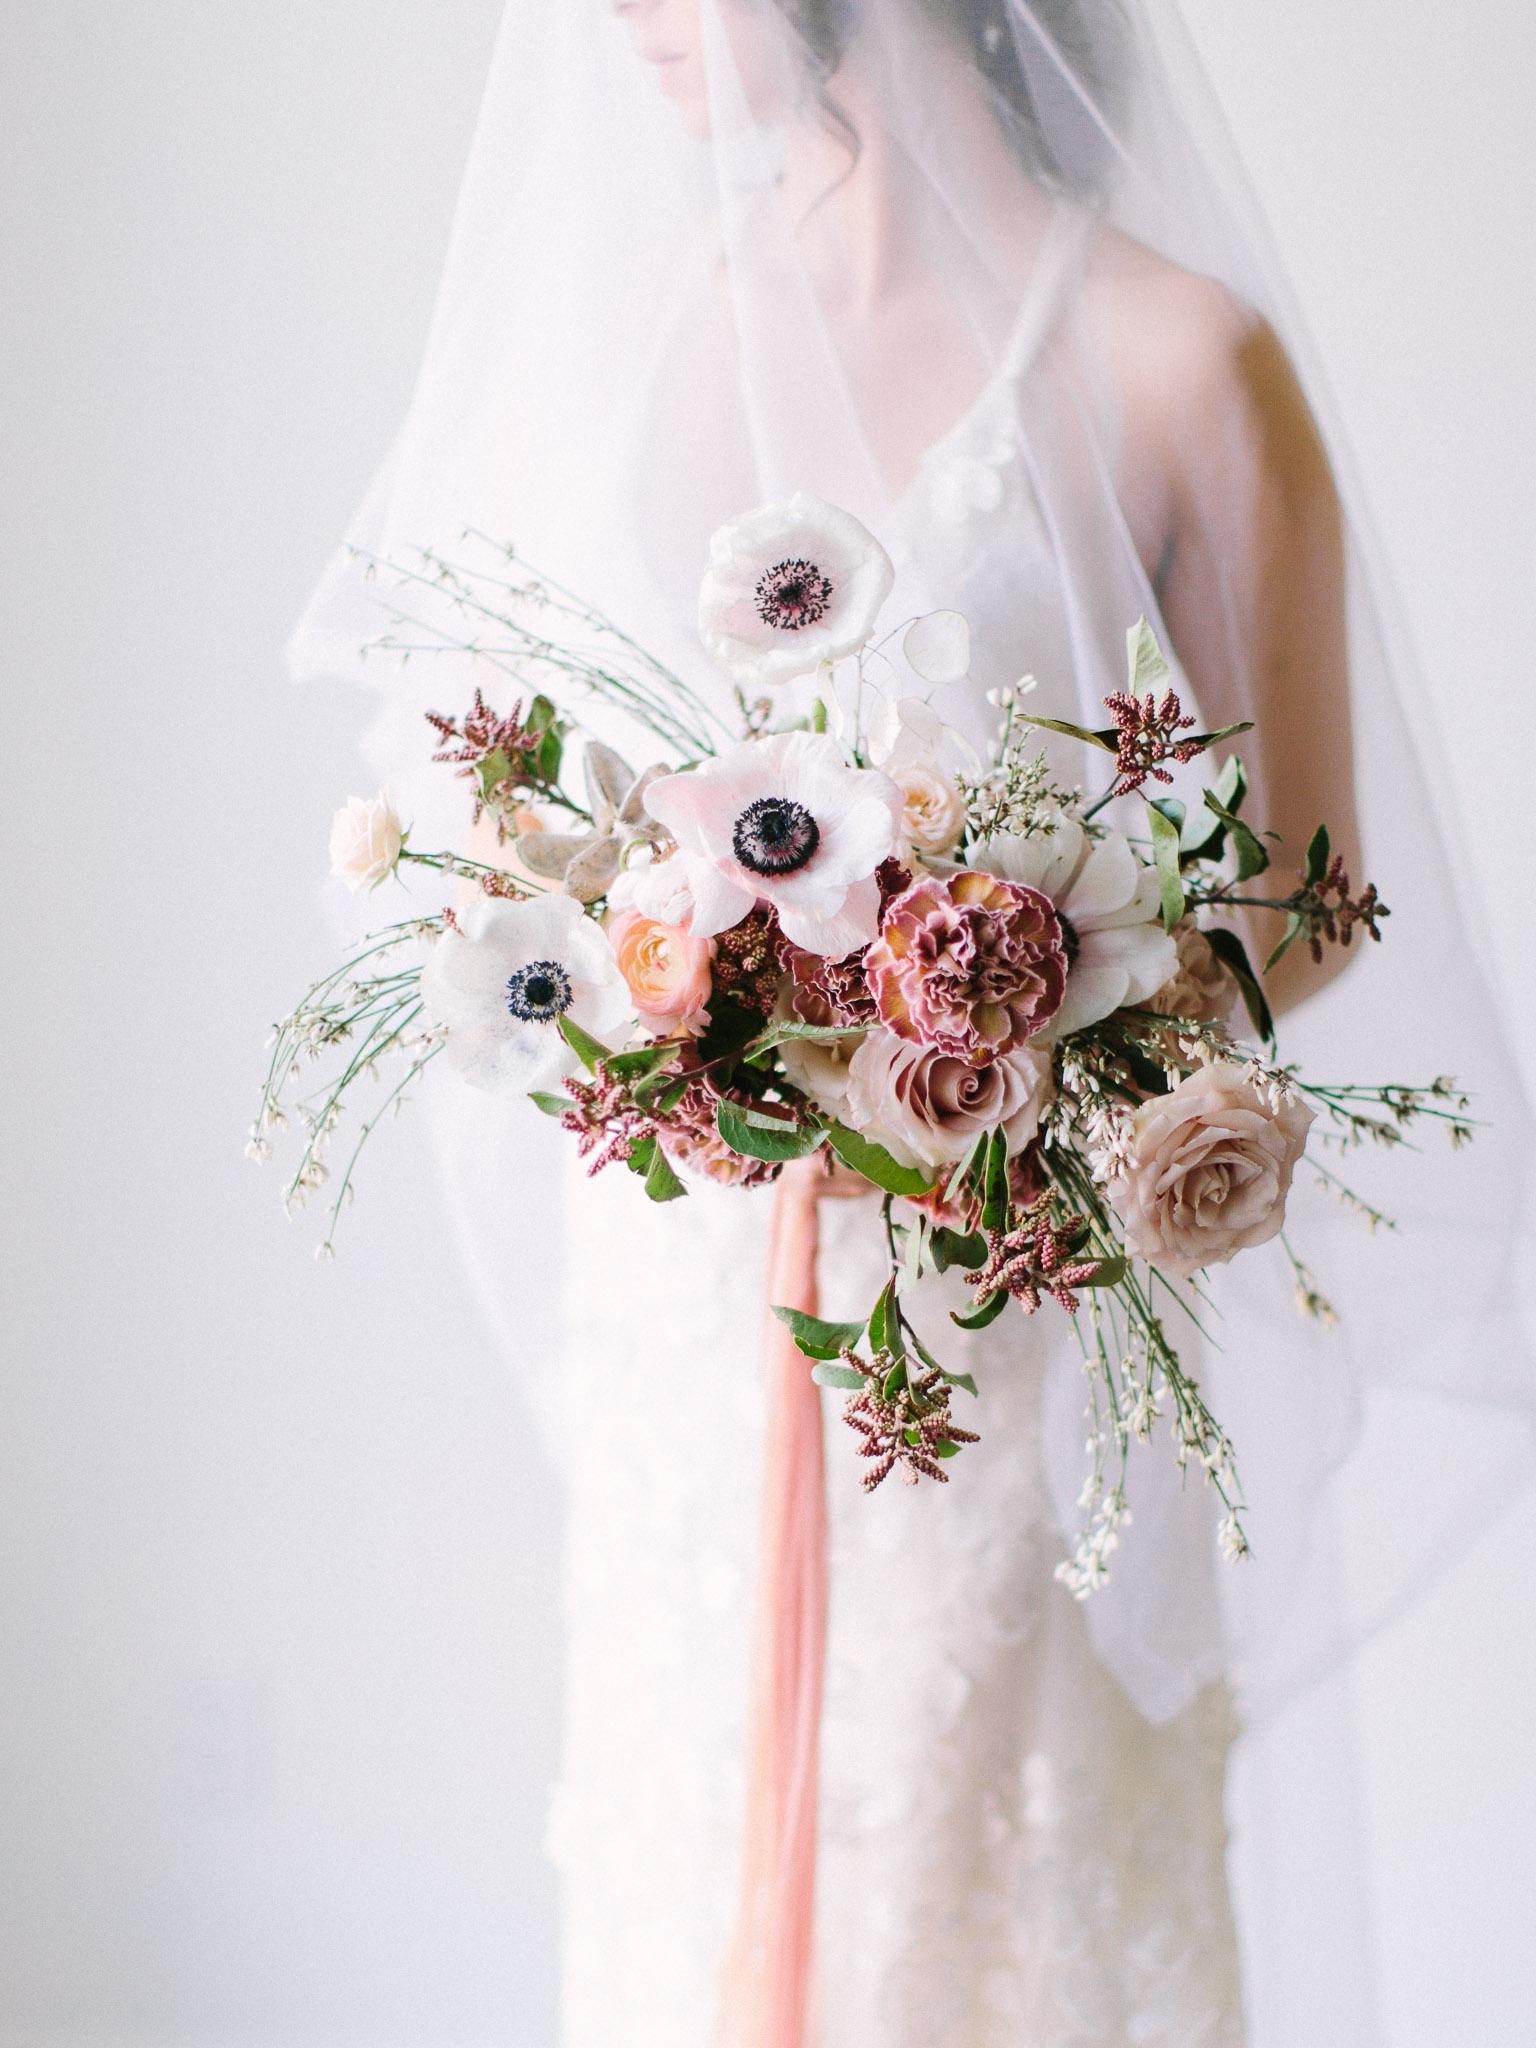 ModernNaturalStyledShoot_MaricleKang_Vancouver Wedding Photographer__0258.jpg